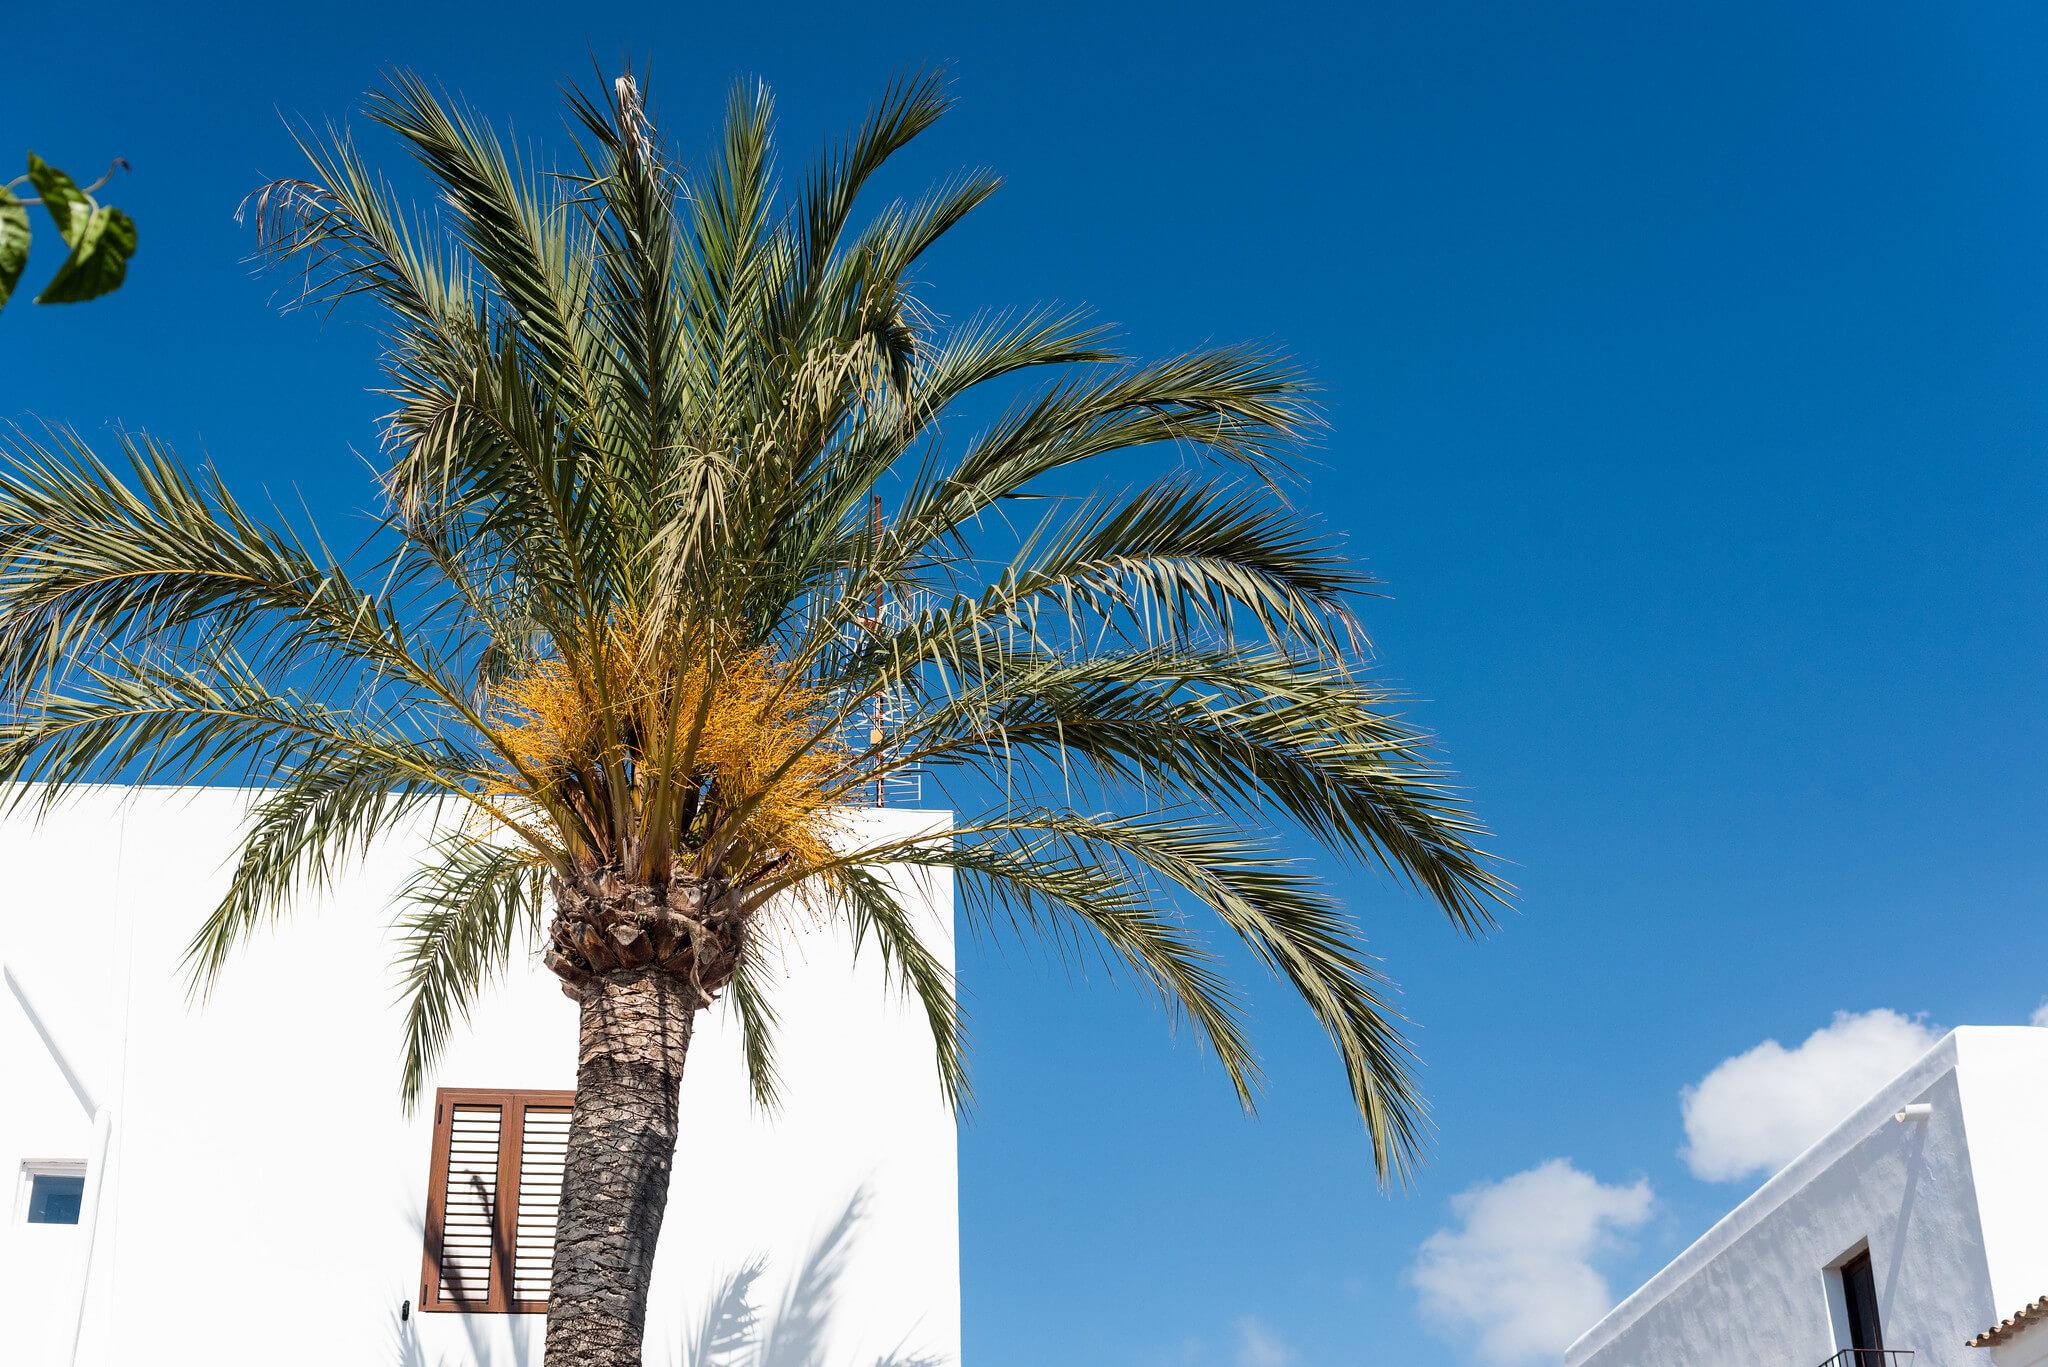 https://www.white-ibiza.com/wp-content/uploads/2020/05/white-ibiza-villas-where-to-buy-san-juan-08.jpg